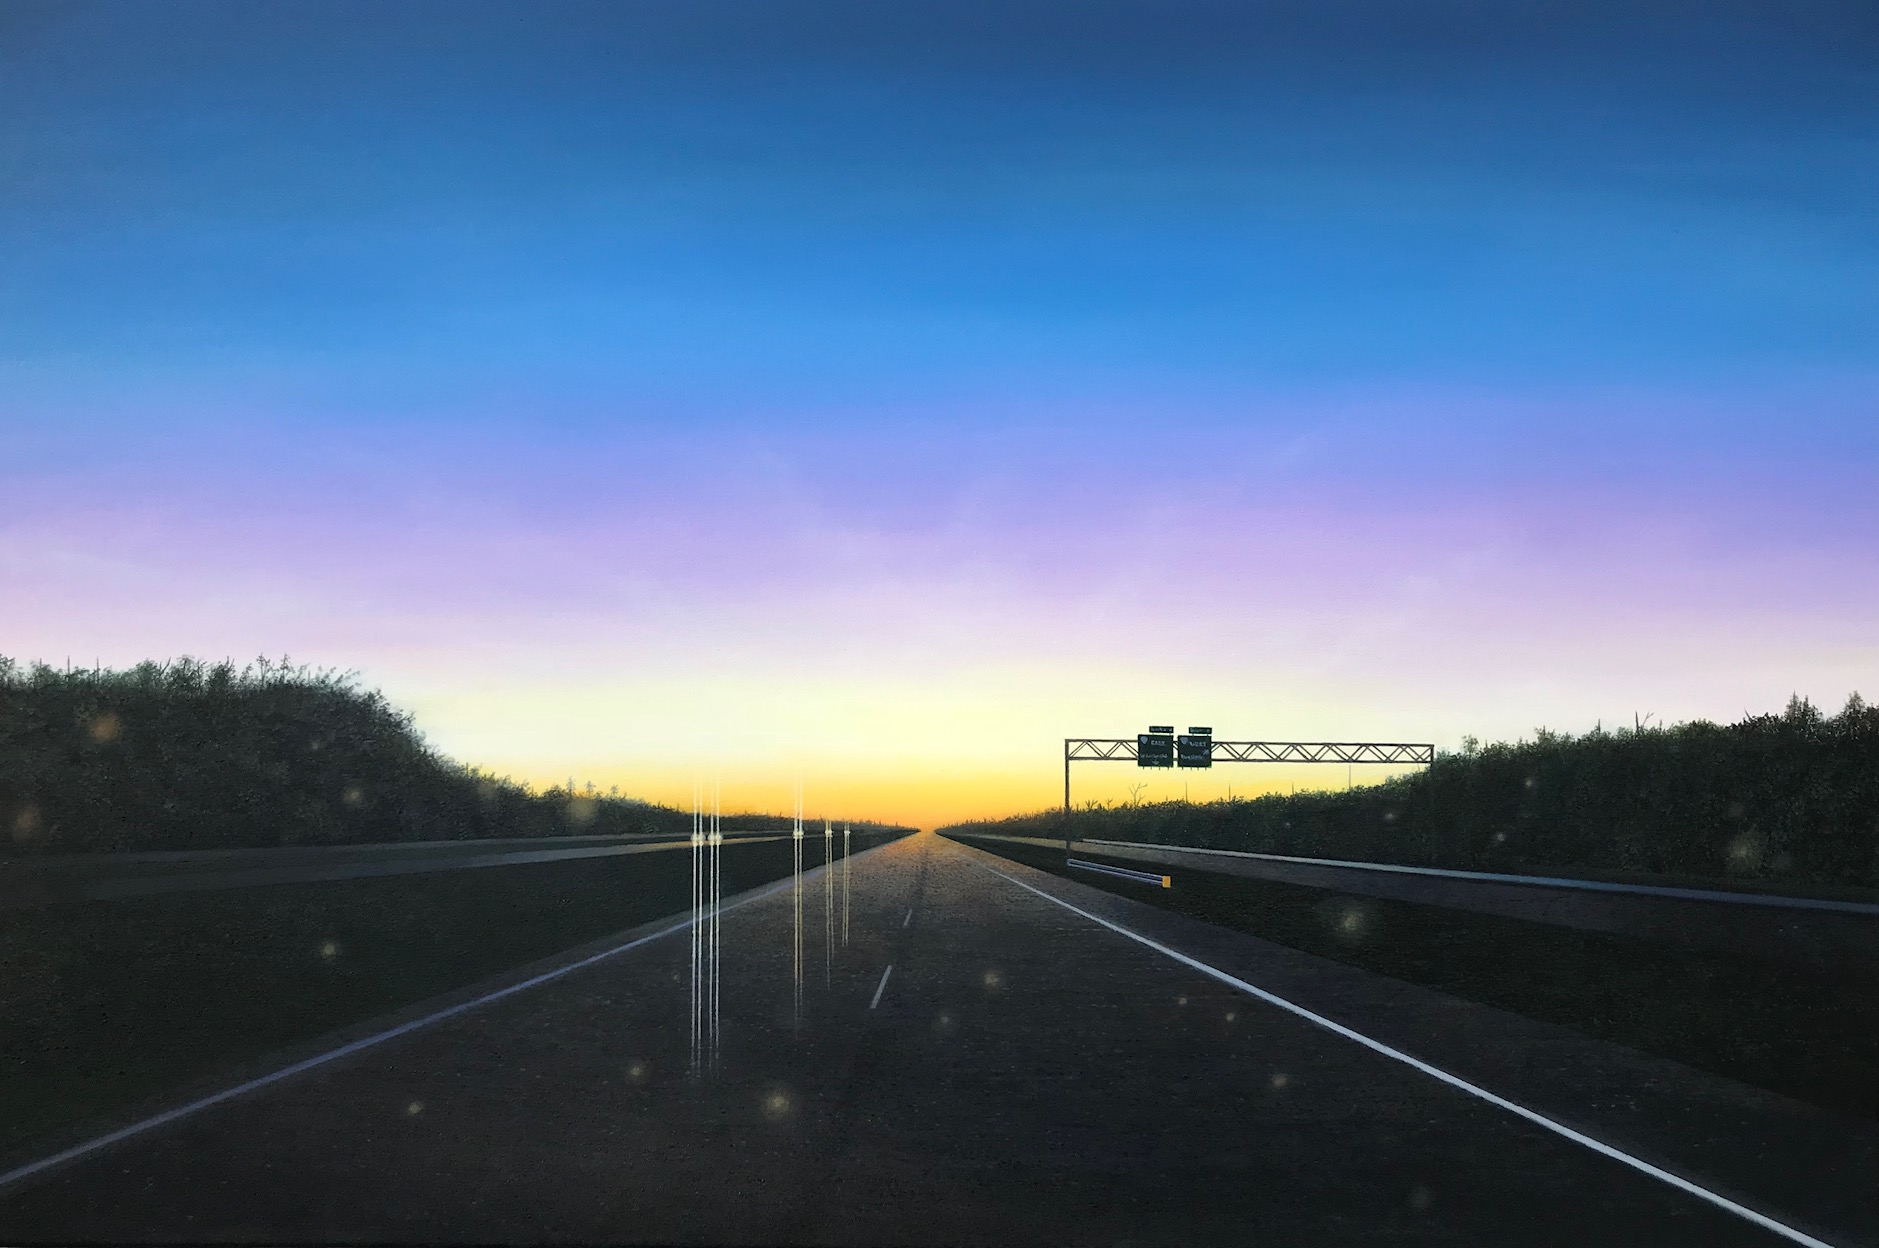 vanishing point, horizon line, highwayscape